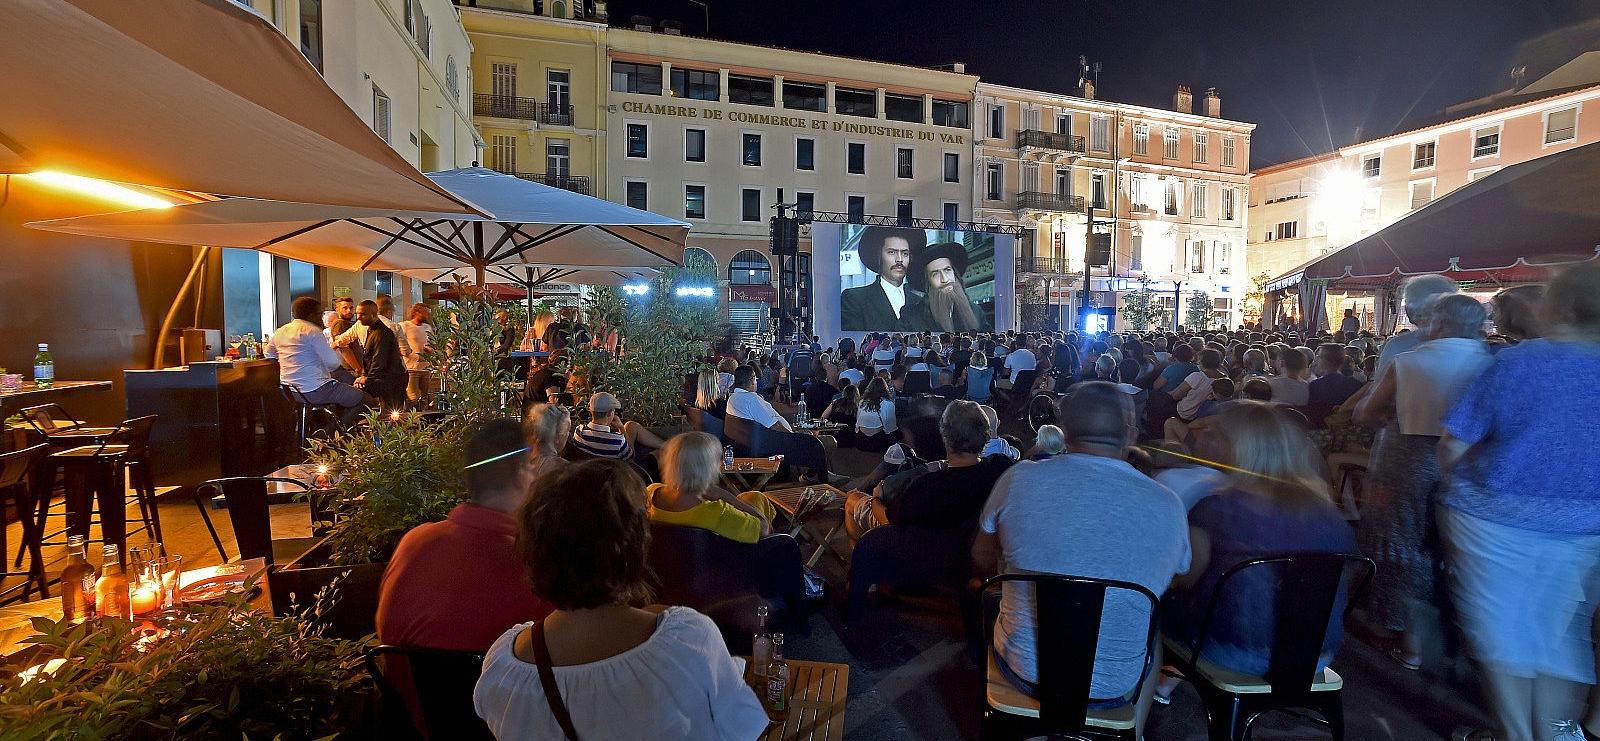 Cinéma de plein air en Août